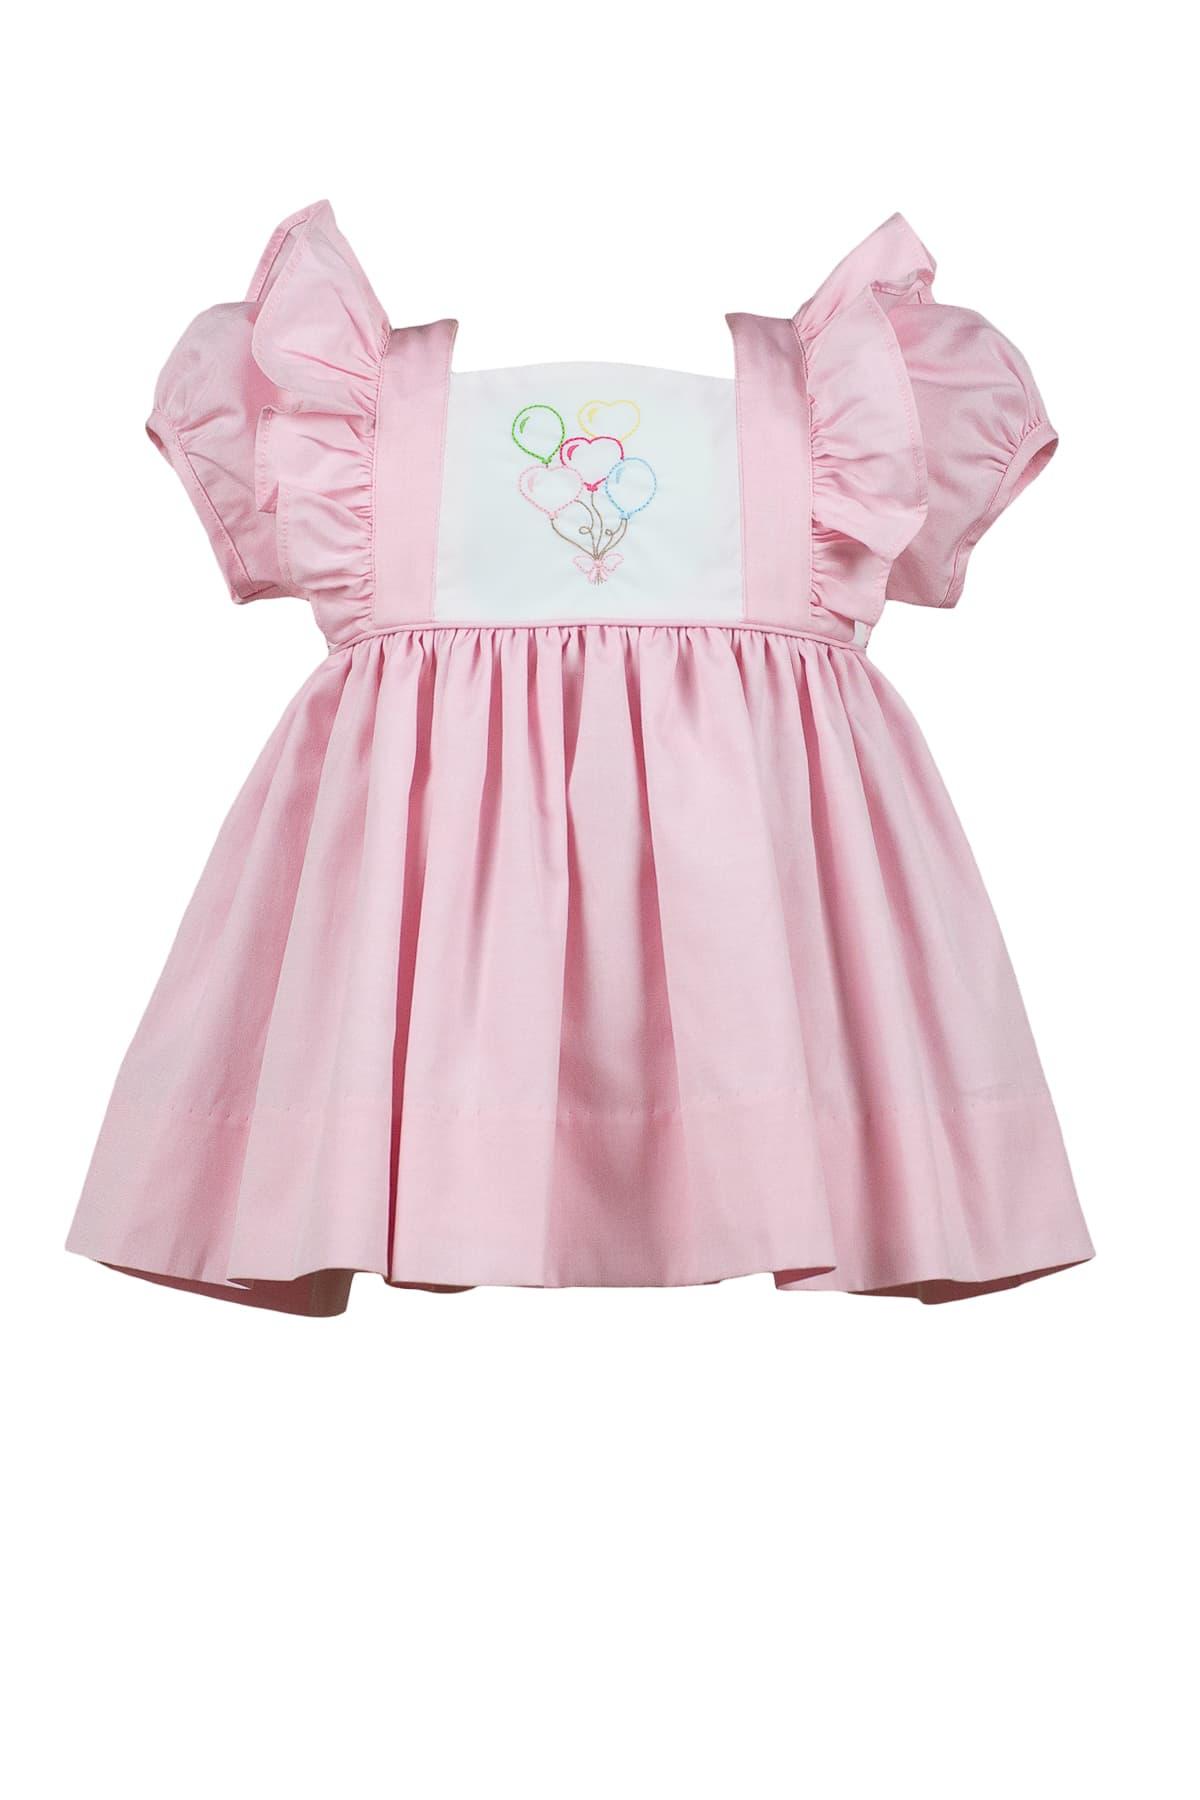 BALLOON BIRTHDAY DRESS